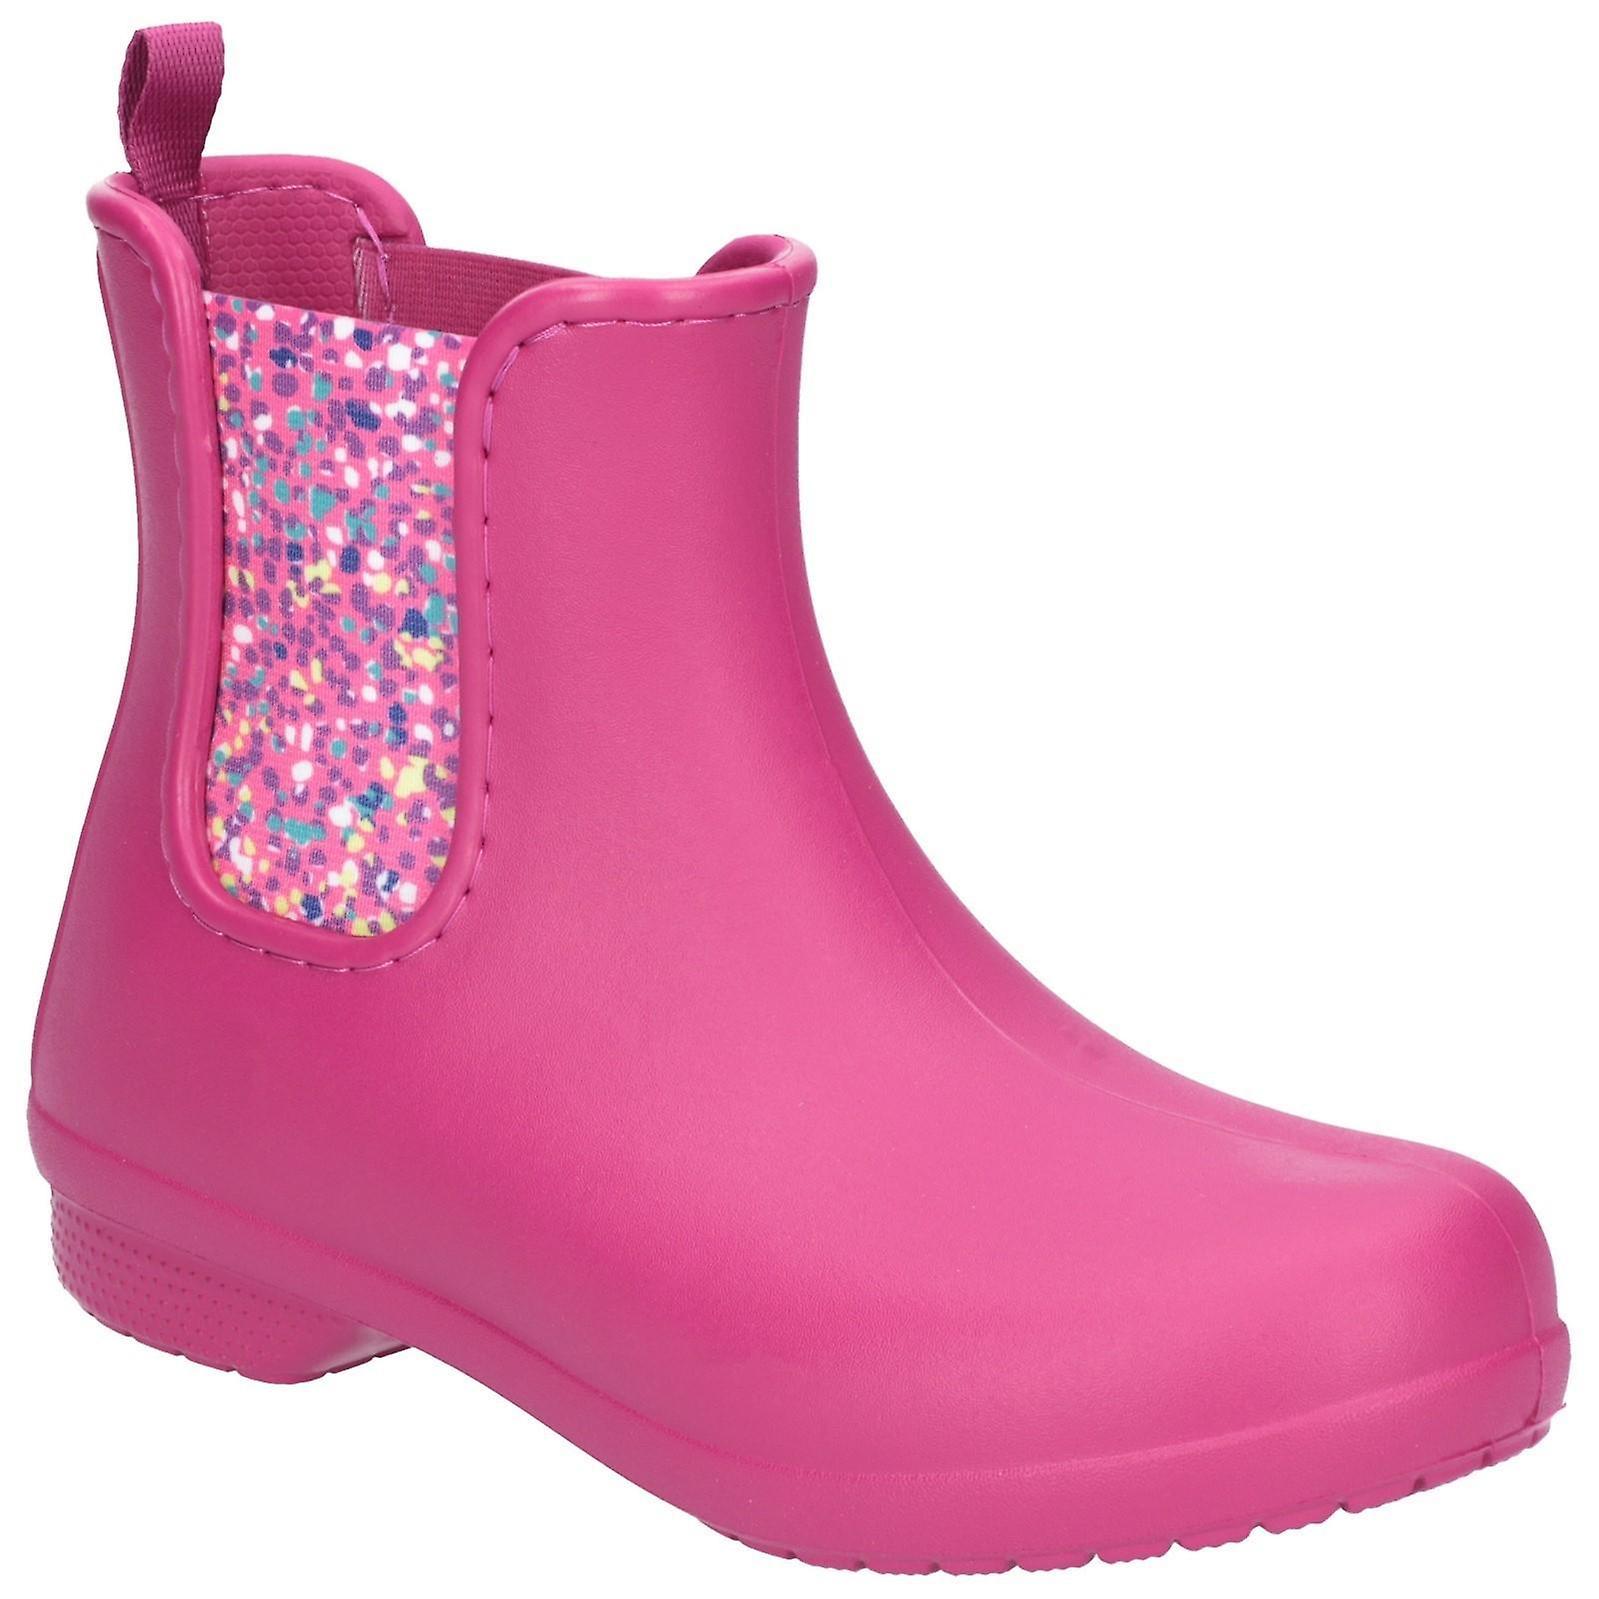 Crocs Womens/mesdames Freesail Chelsea Boot